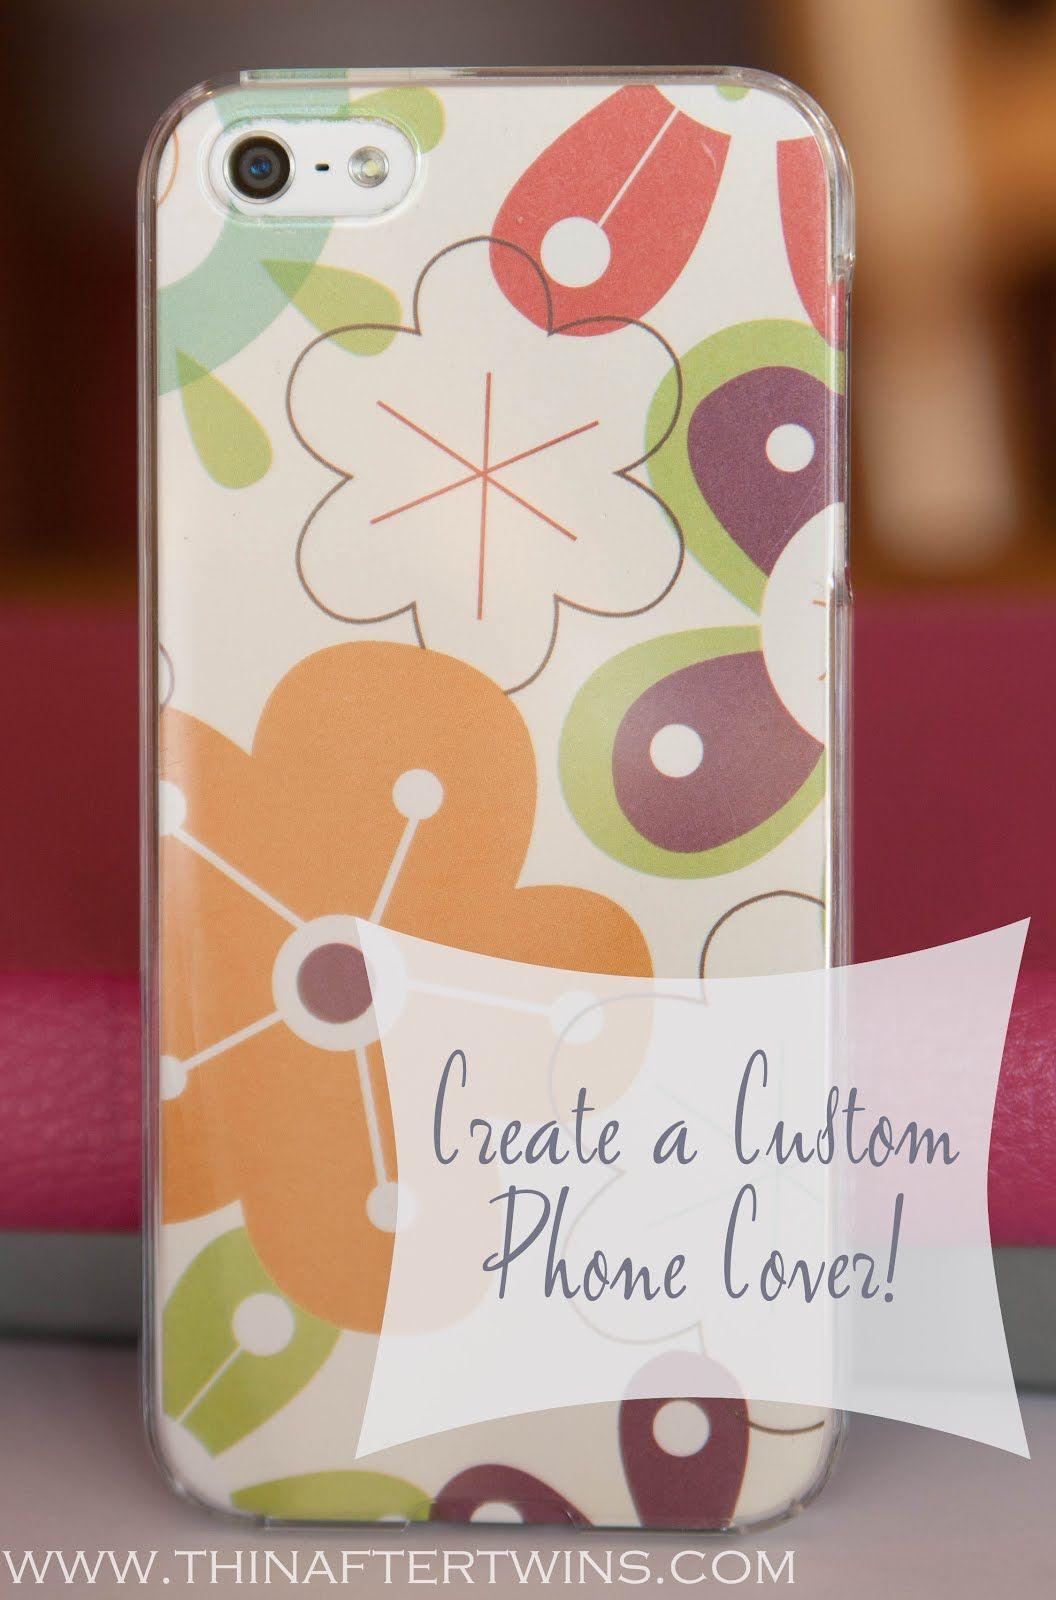 Scrapbook paper case - Custom Phone Case Tutorial Using Scrapbook Paper